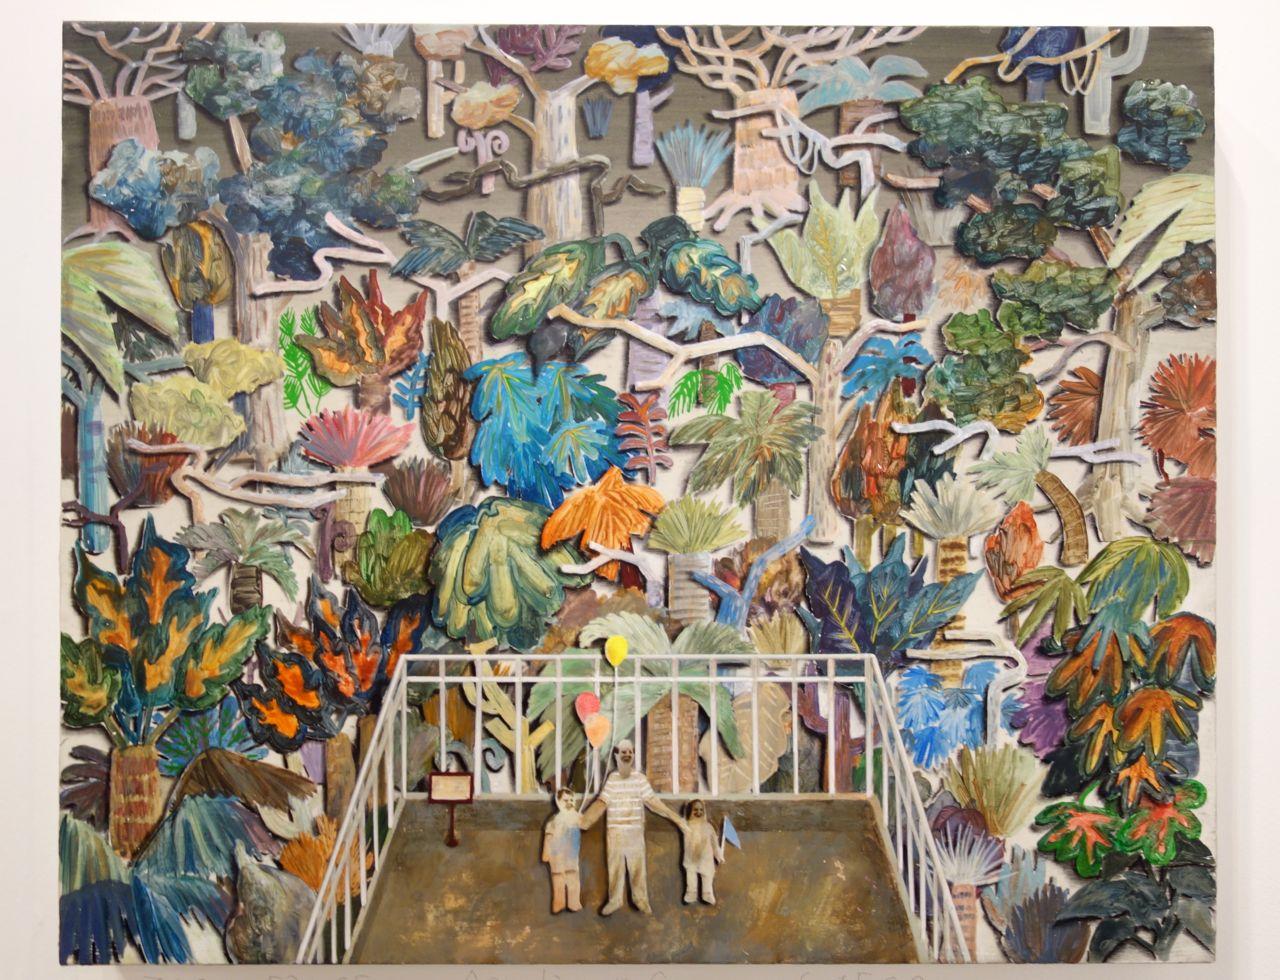 Lai Wei-Yu, 'Zoo', 2016, Acrylic on canvas, 53 x 65 cm, Yiri Arts (Taiwan)